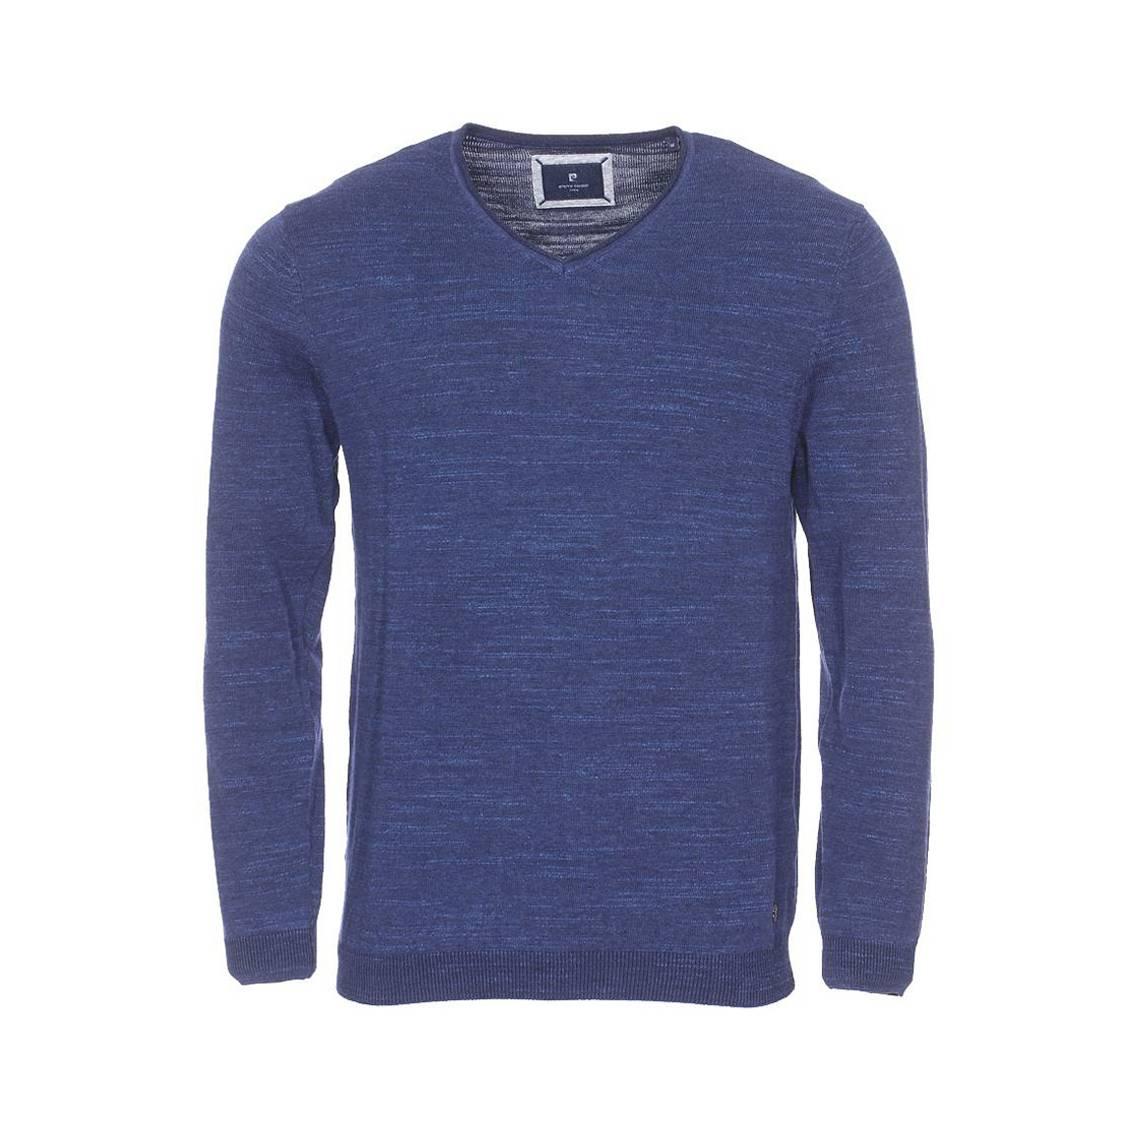 Pull col v  tricot en coton bleu indigo chiné